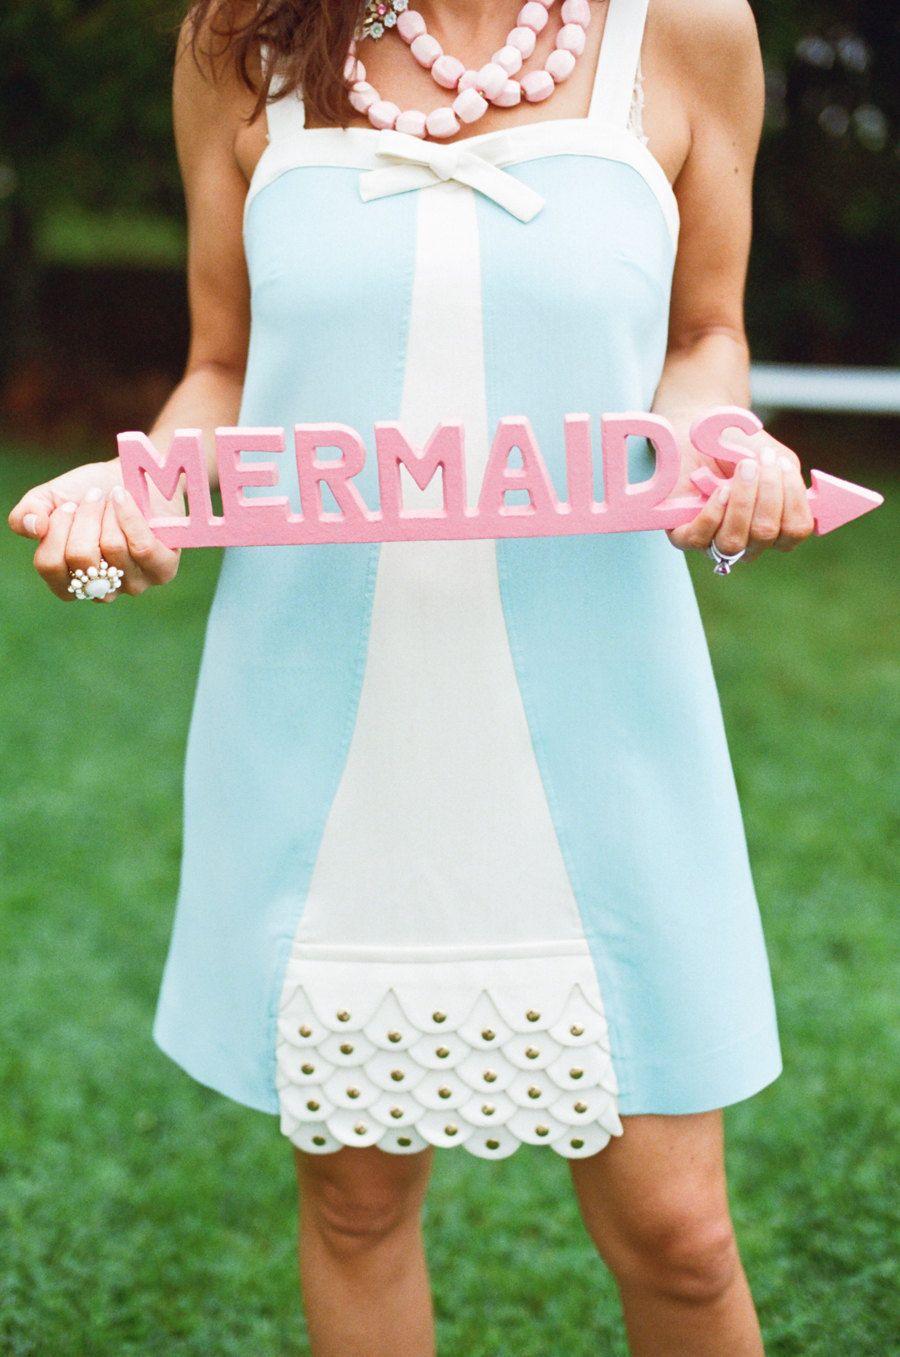 Mermaid Sign - Coastal Decor - Pick Your Color